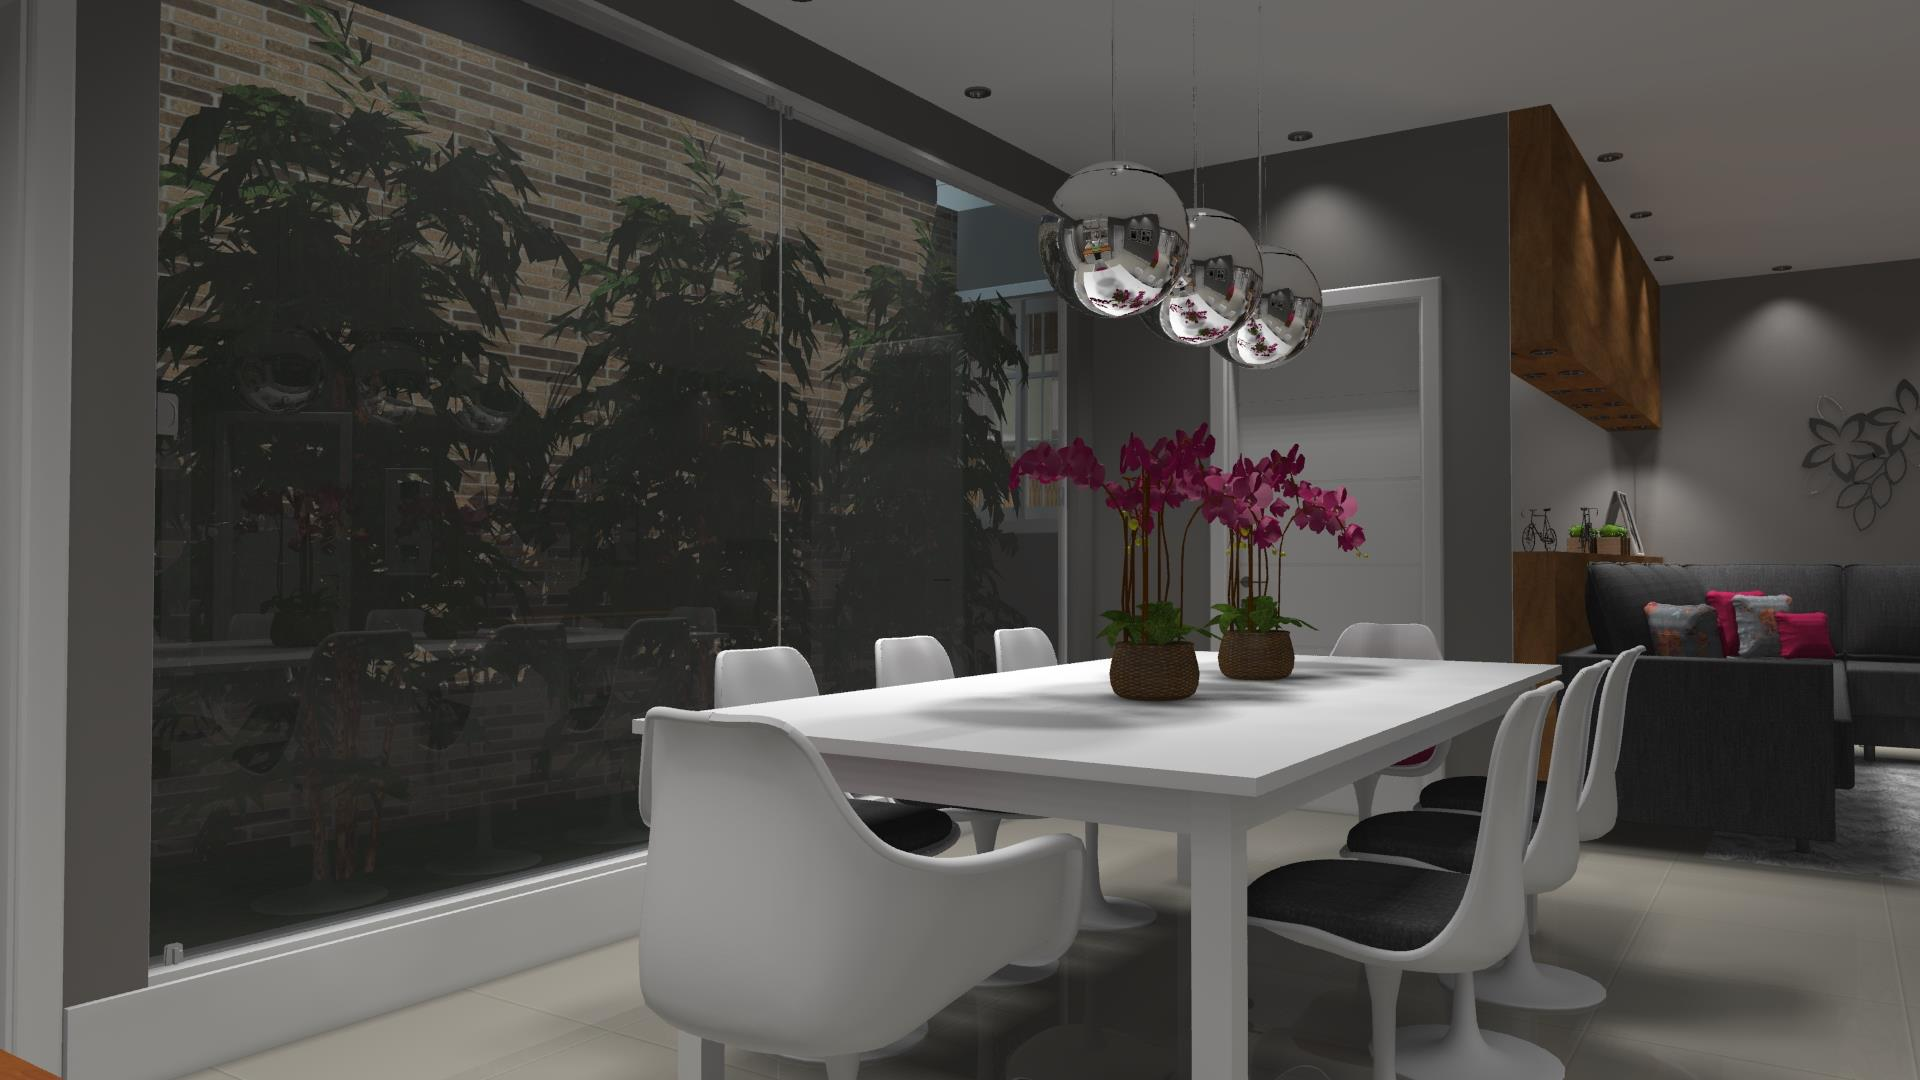 sala-de-jantar-projeto